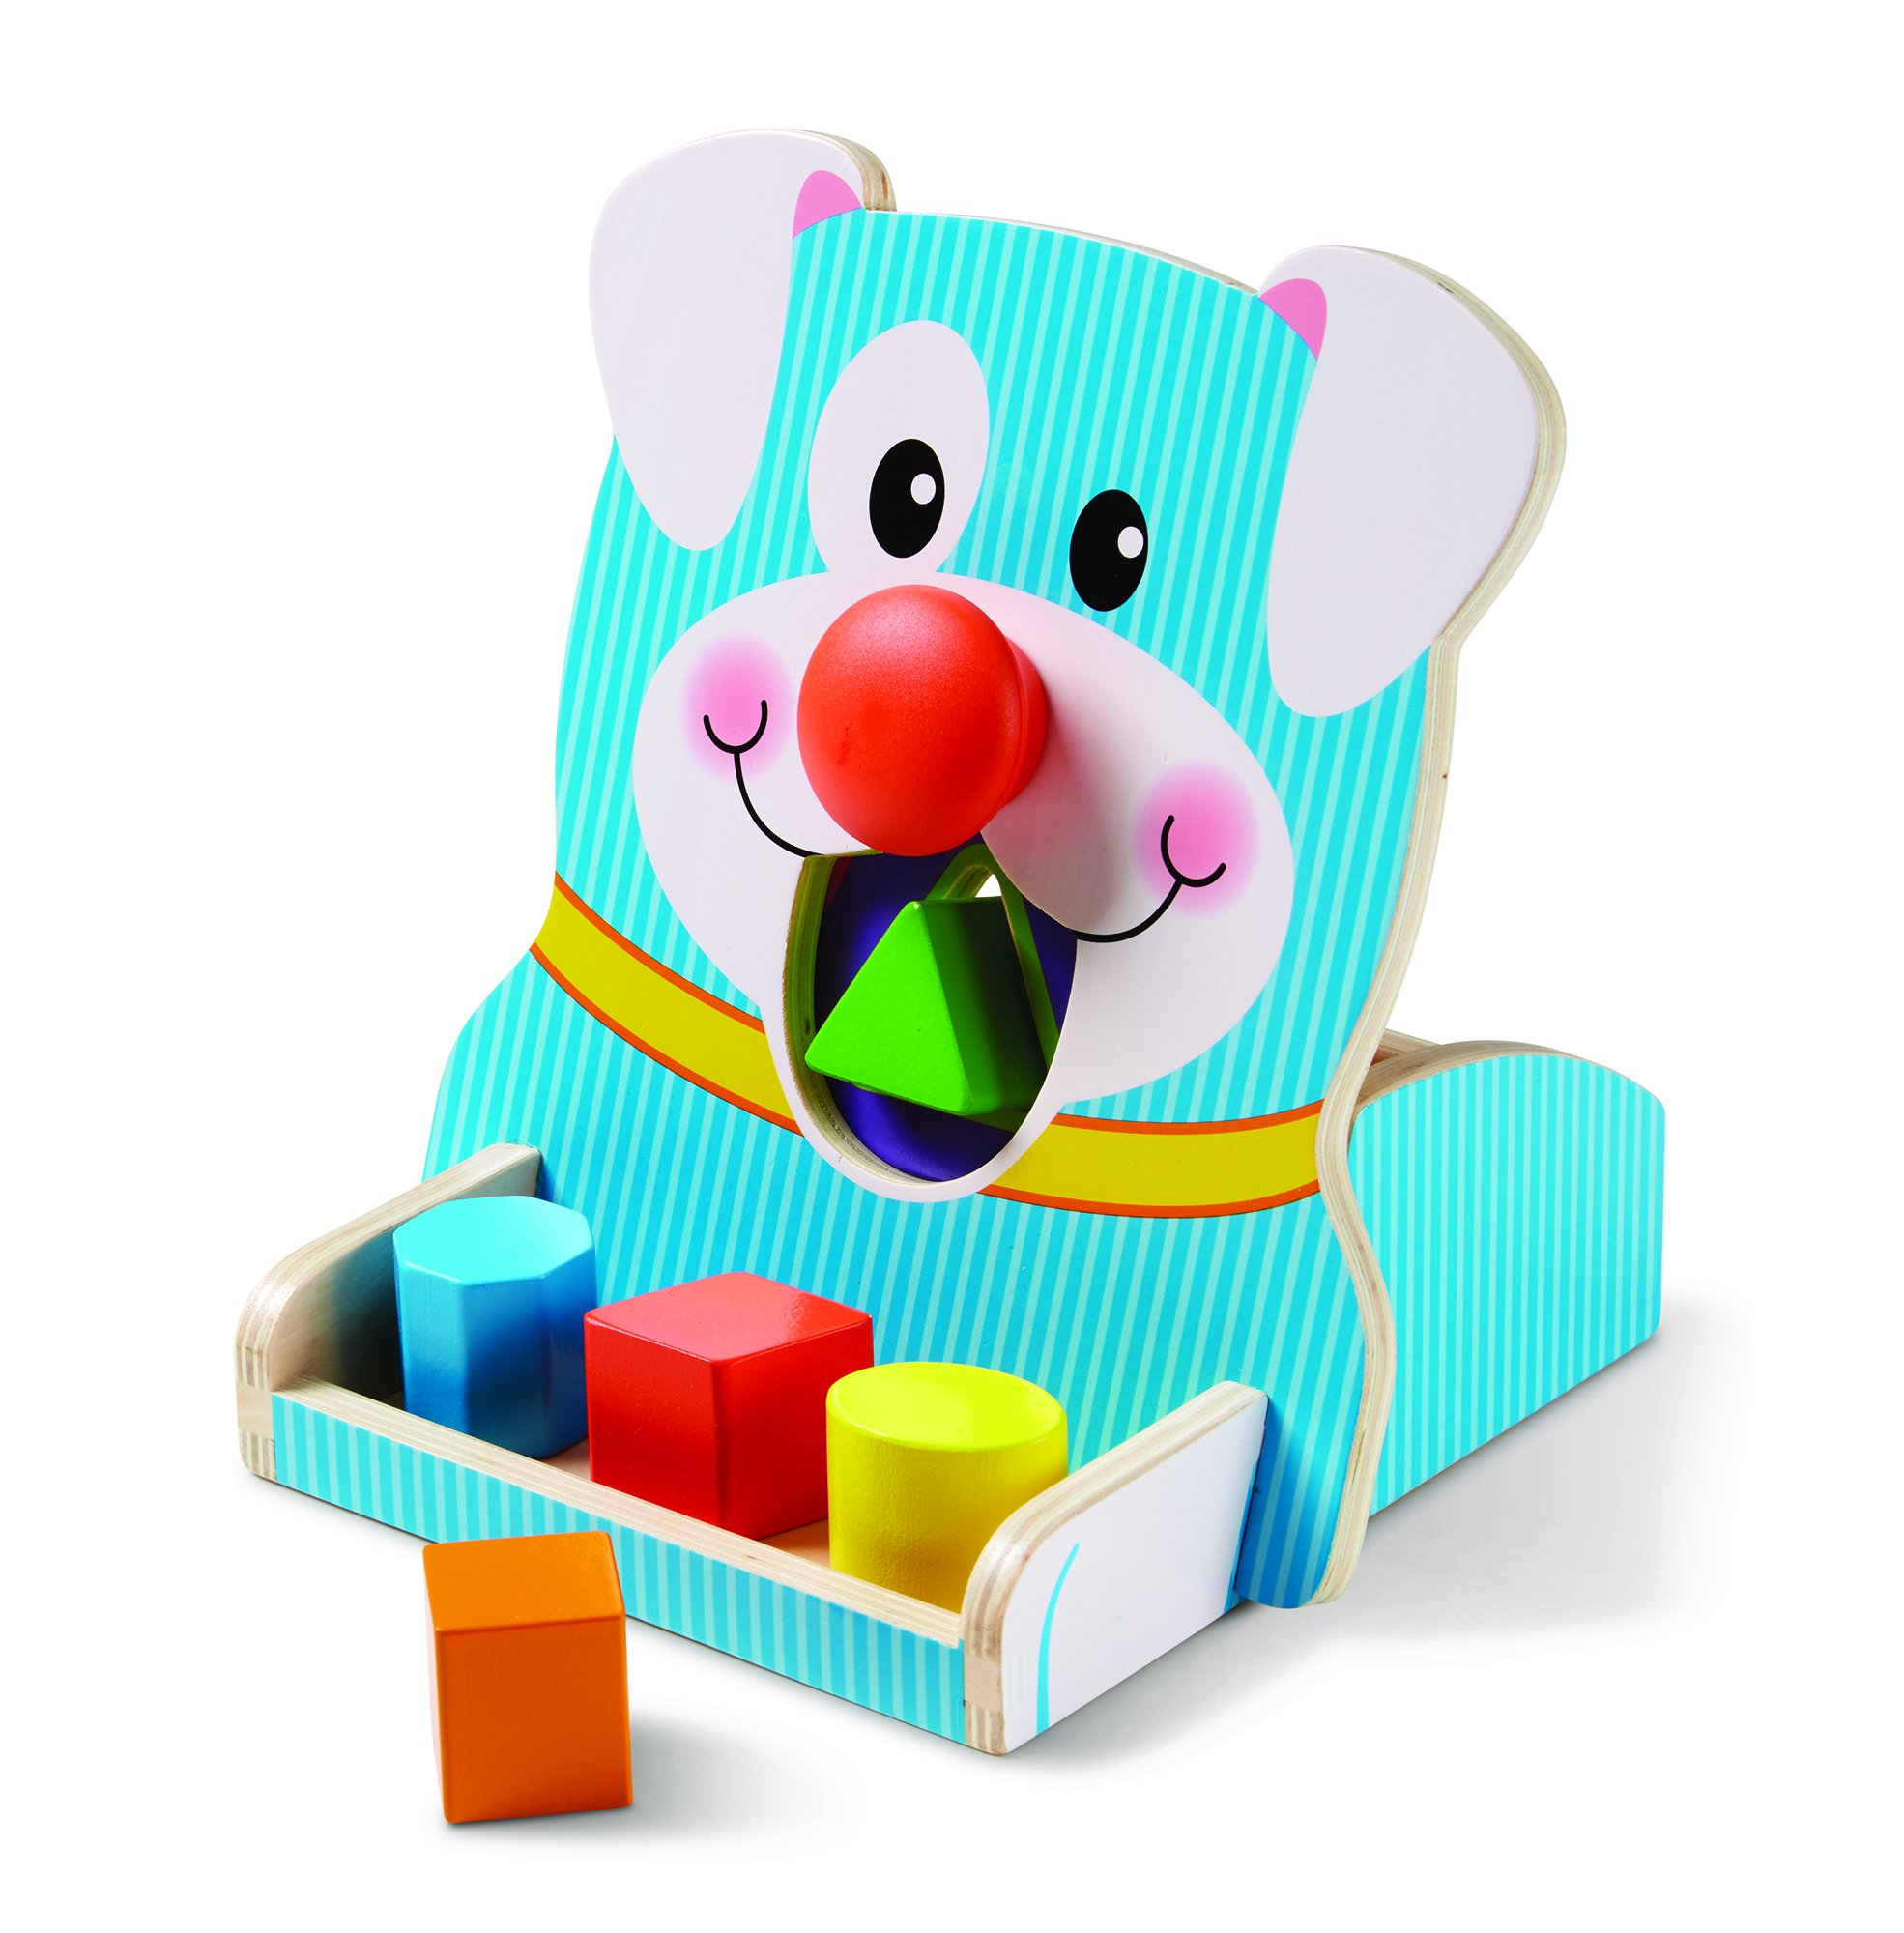 Melissa & Doug Spin & Feed Shape Sorter Baby Toy, Multi